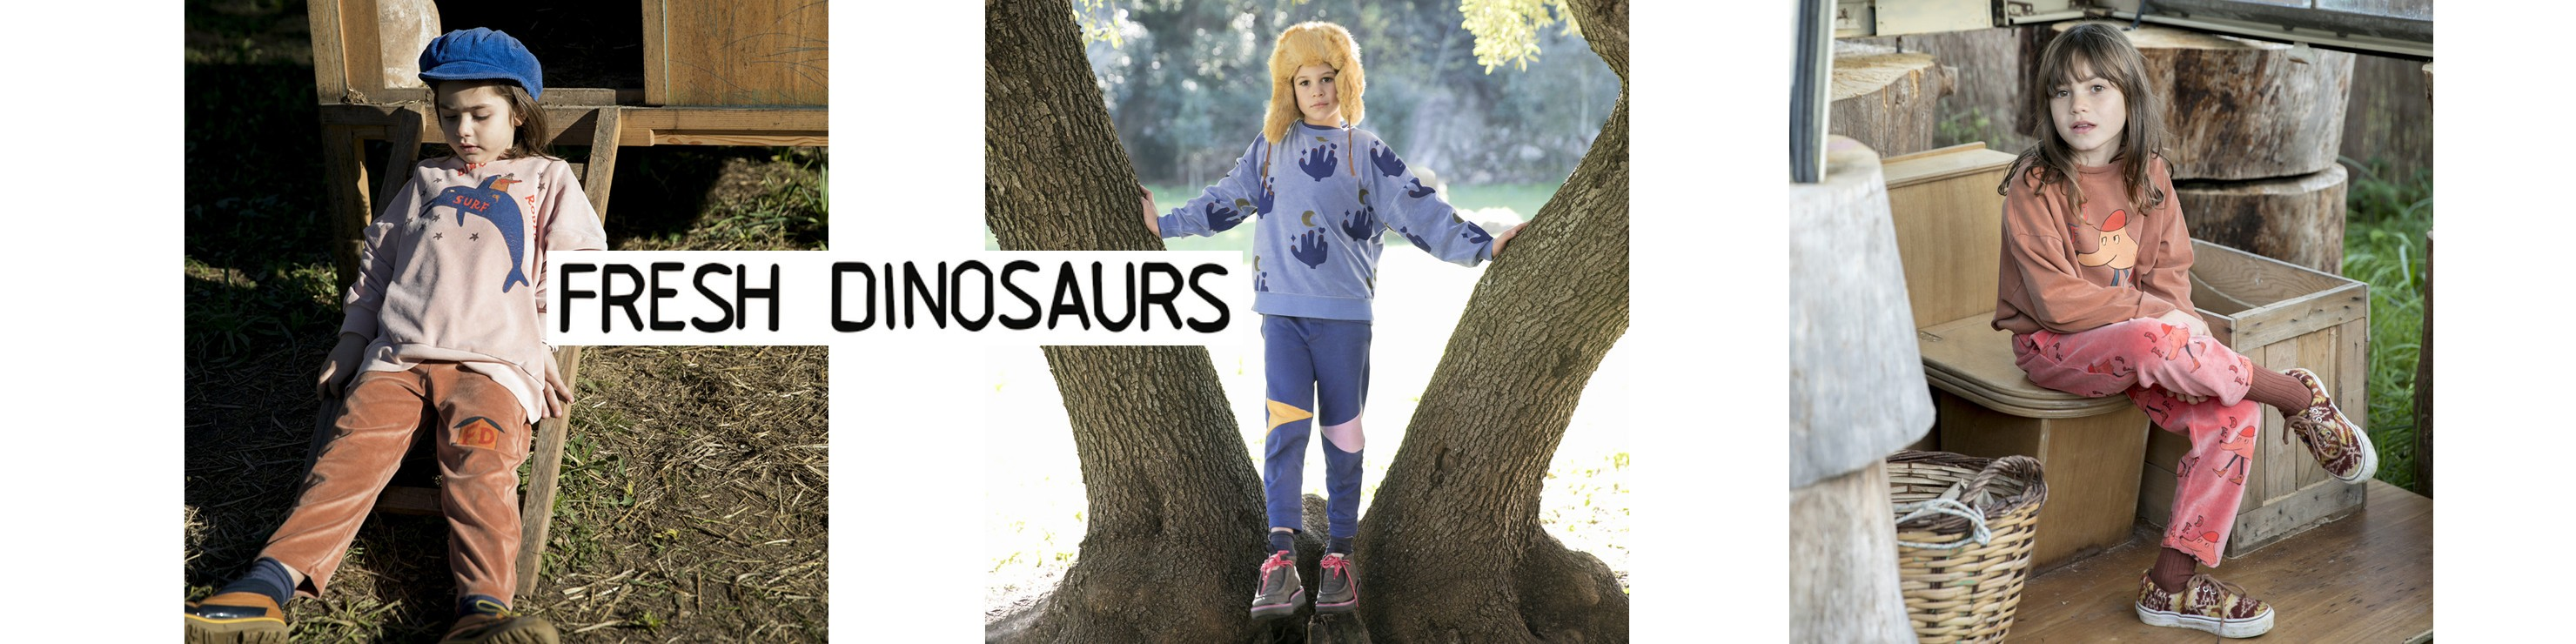 Fresh Dinosaurs AW19 : Stay gold, Ponyboy, une jolie collection fabriquée en Espagne